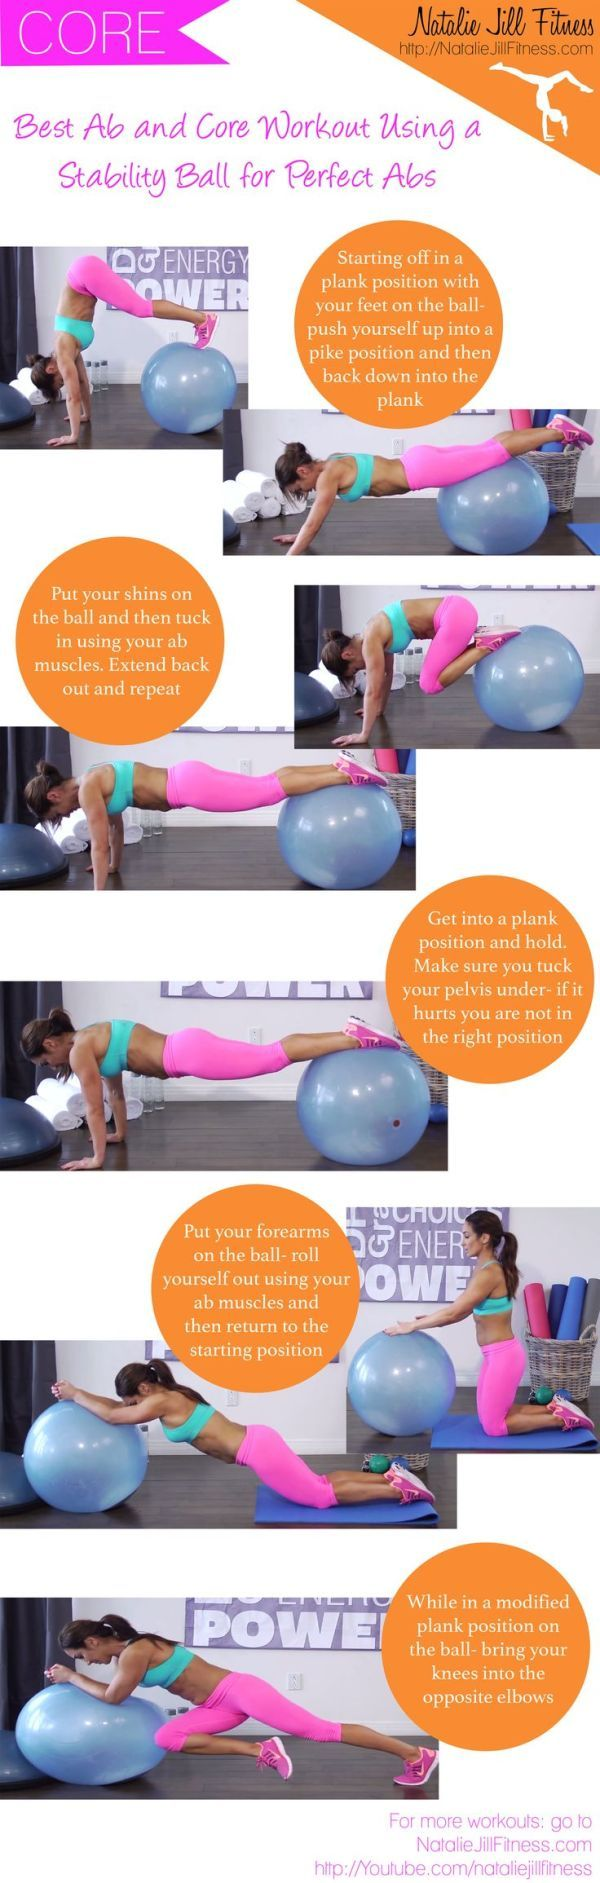 3 Stability Ball Workouts (featuring Natalie Jill)